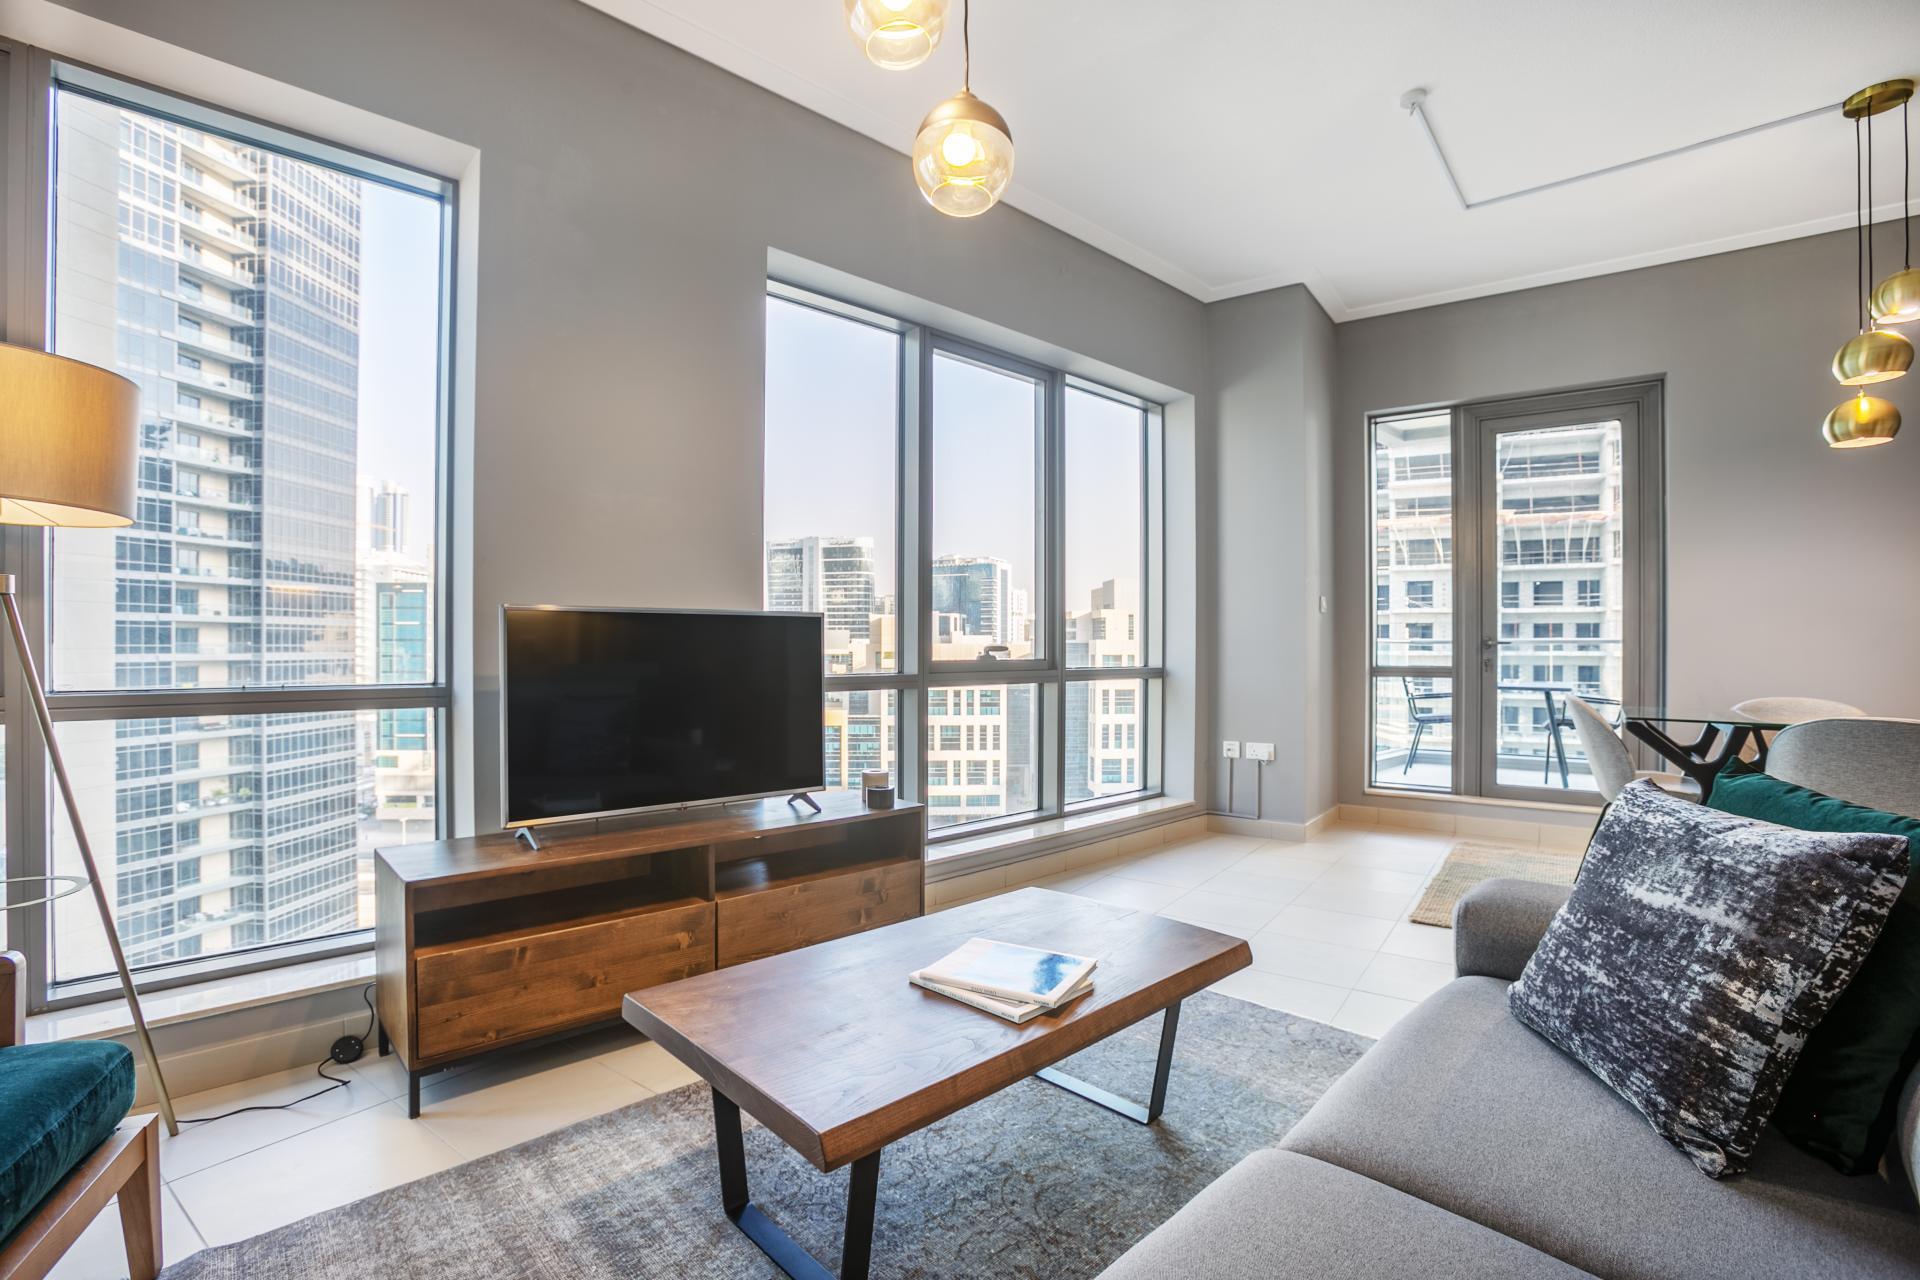 TV at South Ridge Apartment, Financial District, Dubai